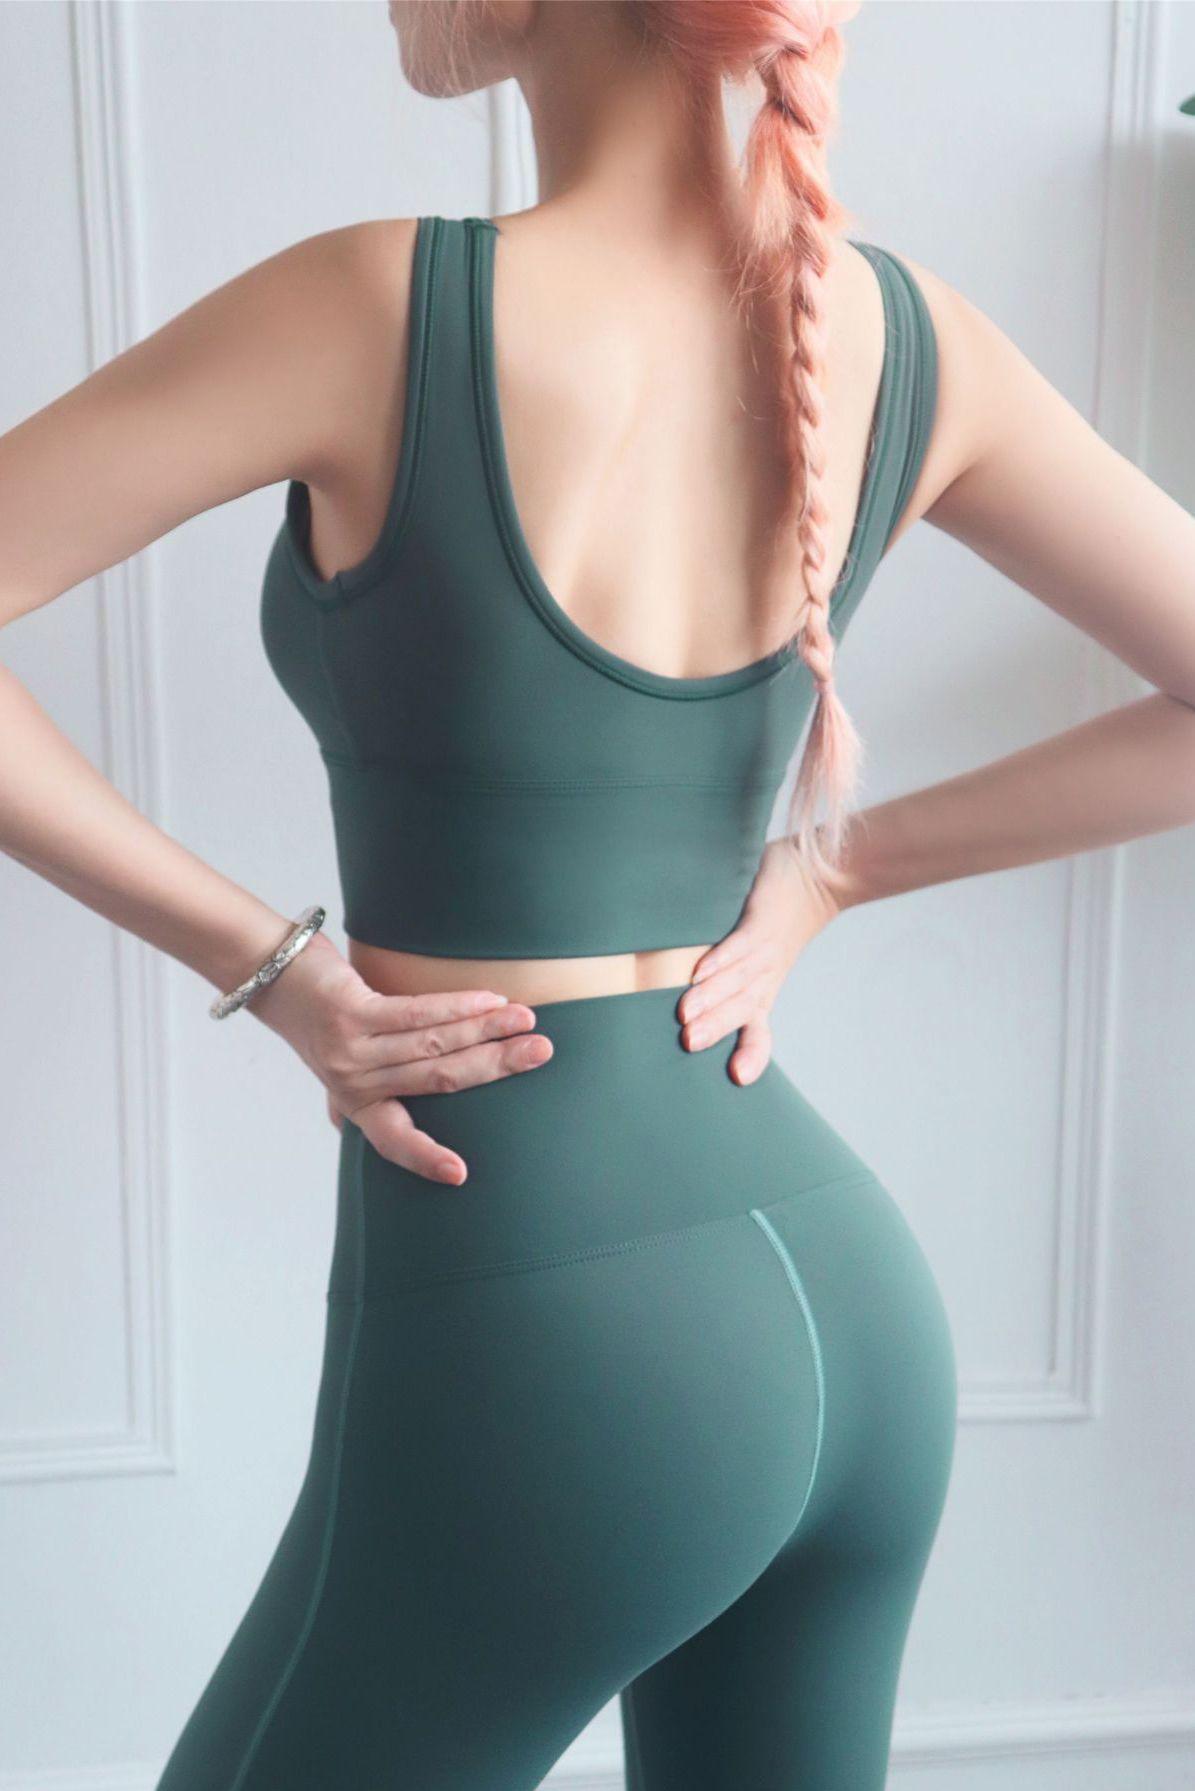 Women Darkgreen Yoga Padded Sport U Back Bra L in 2020